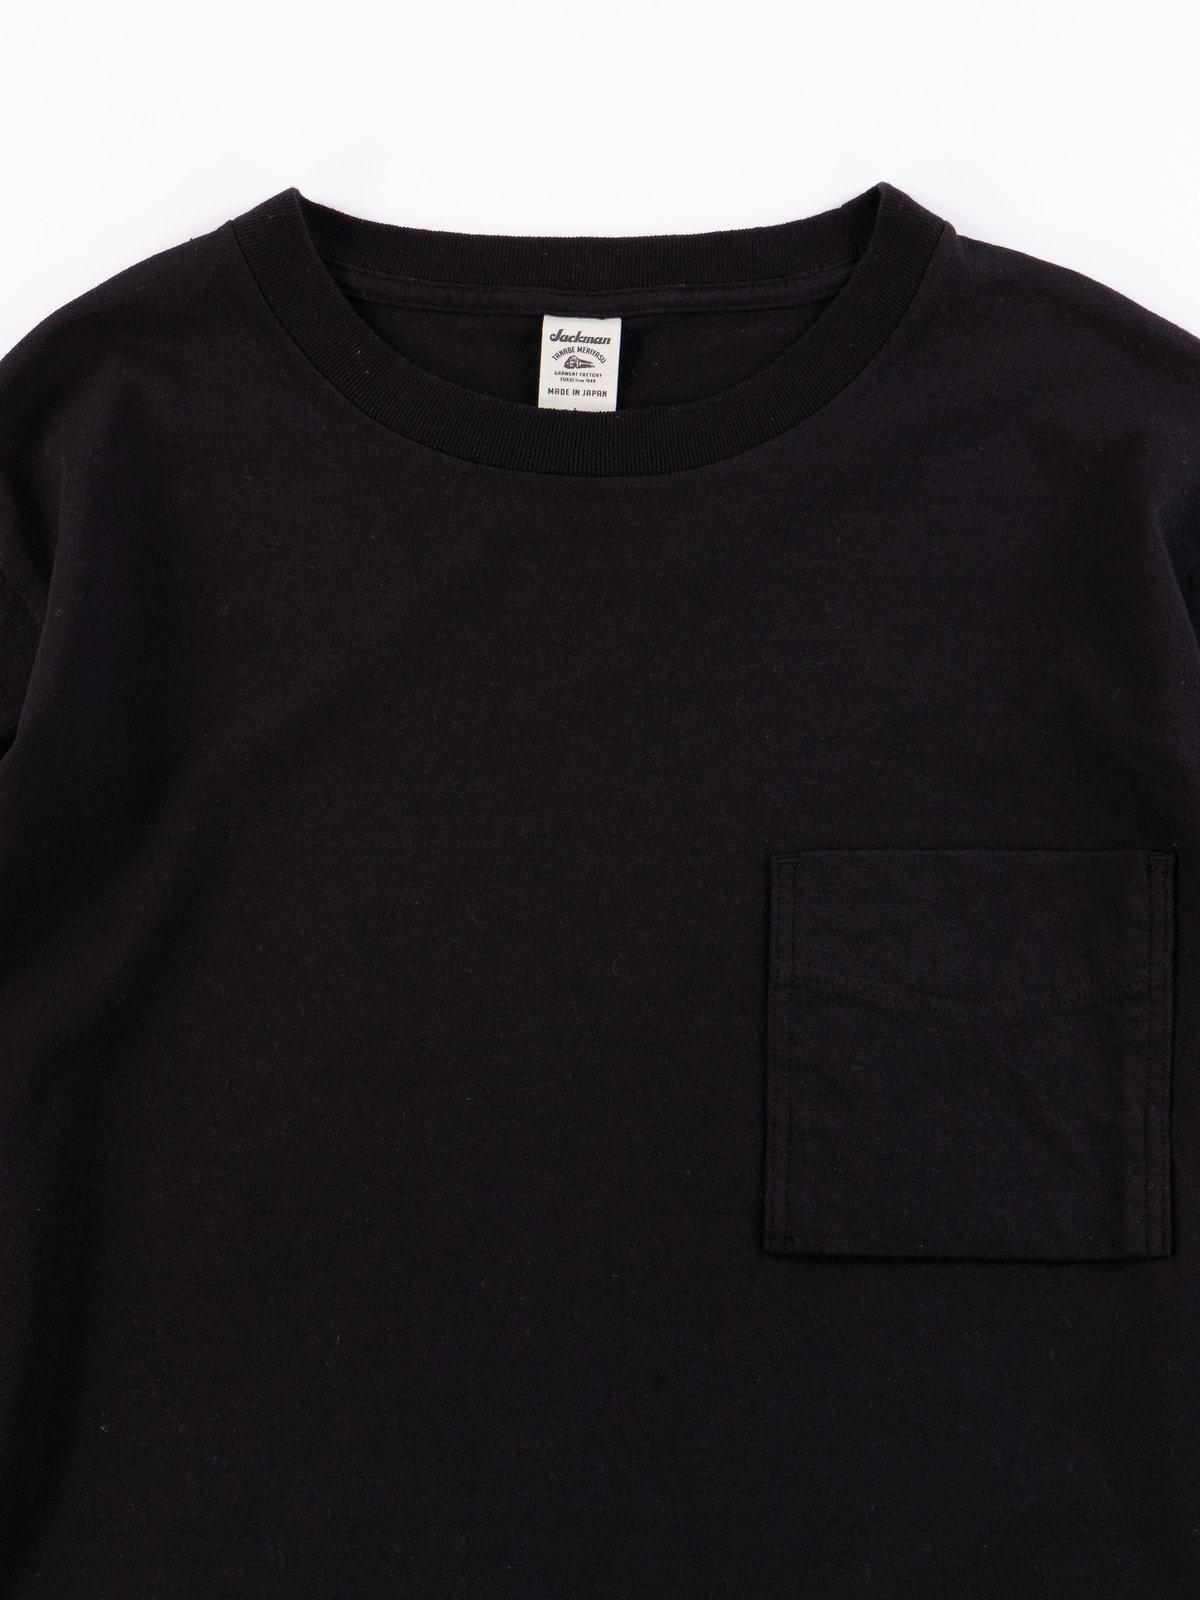 Black Long Sleeve Pocket T–Shirt - Image 3